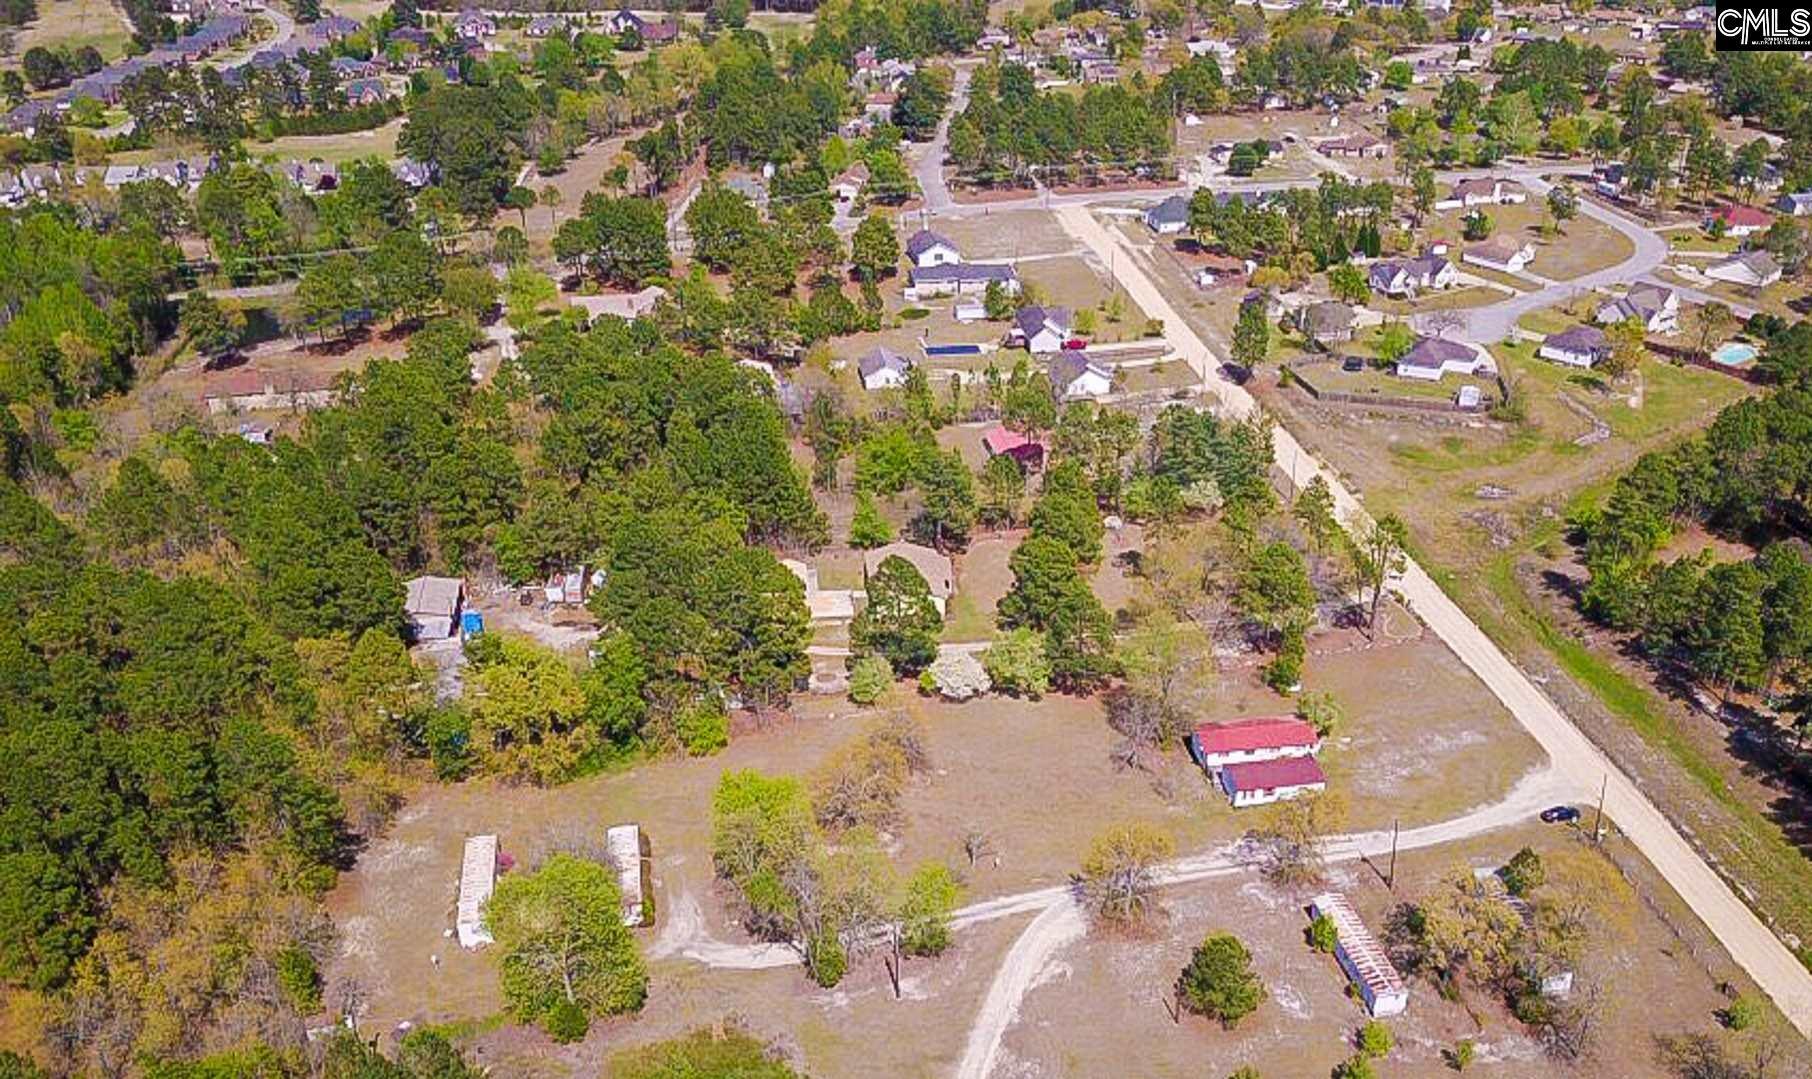 134 Floyd St West Columbia, SC 29172